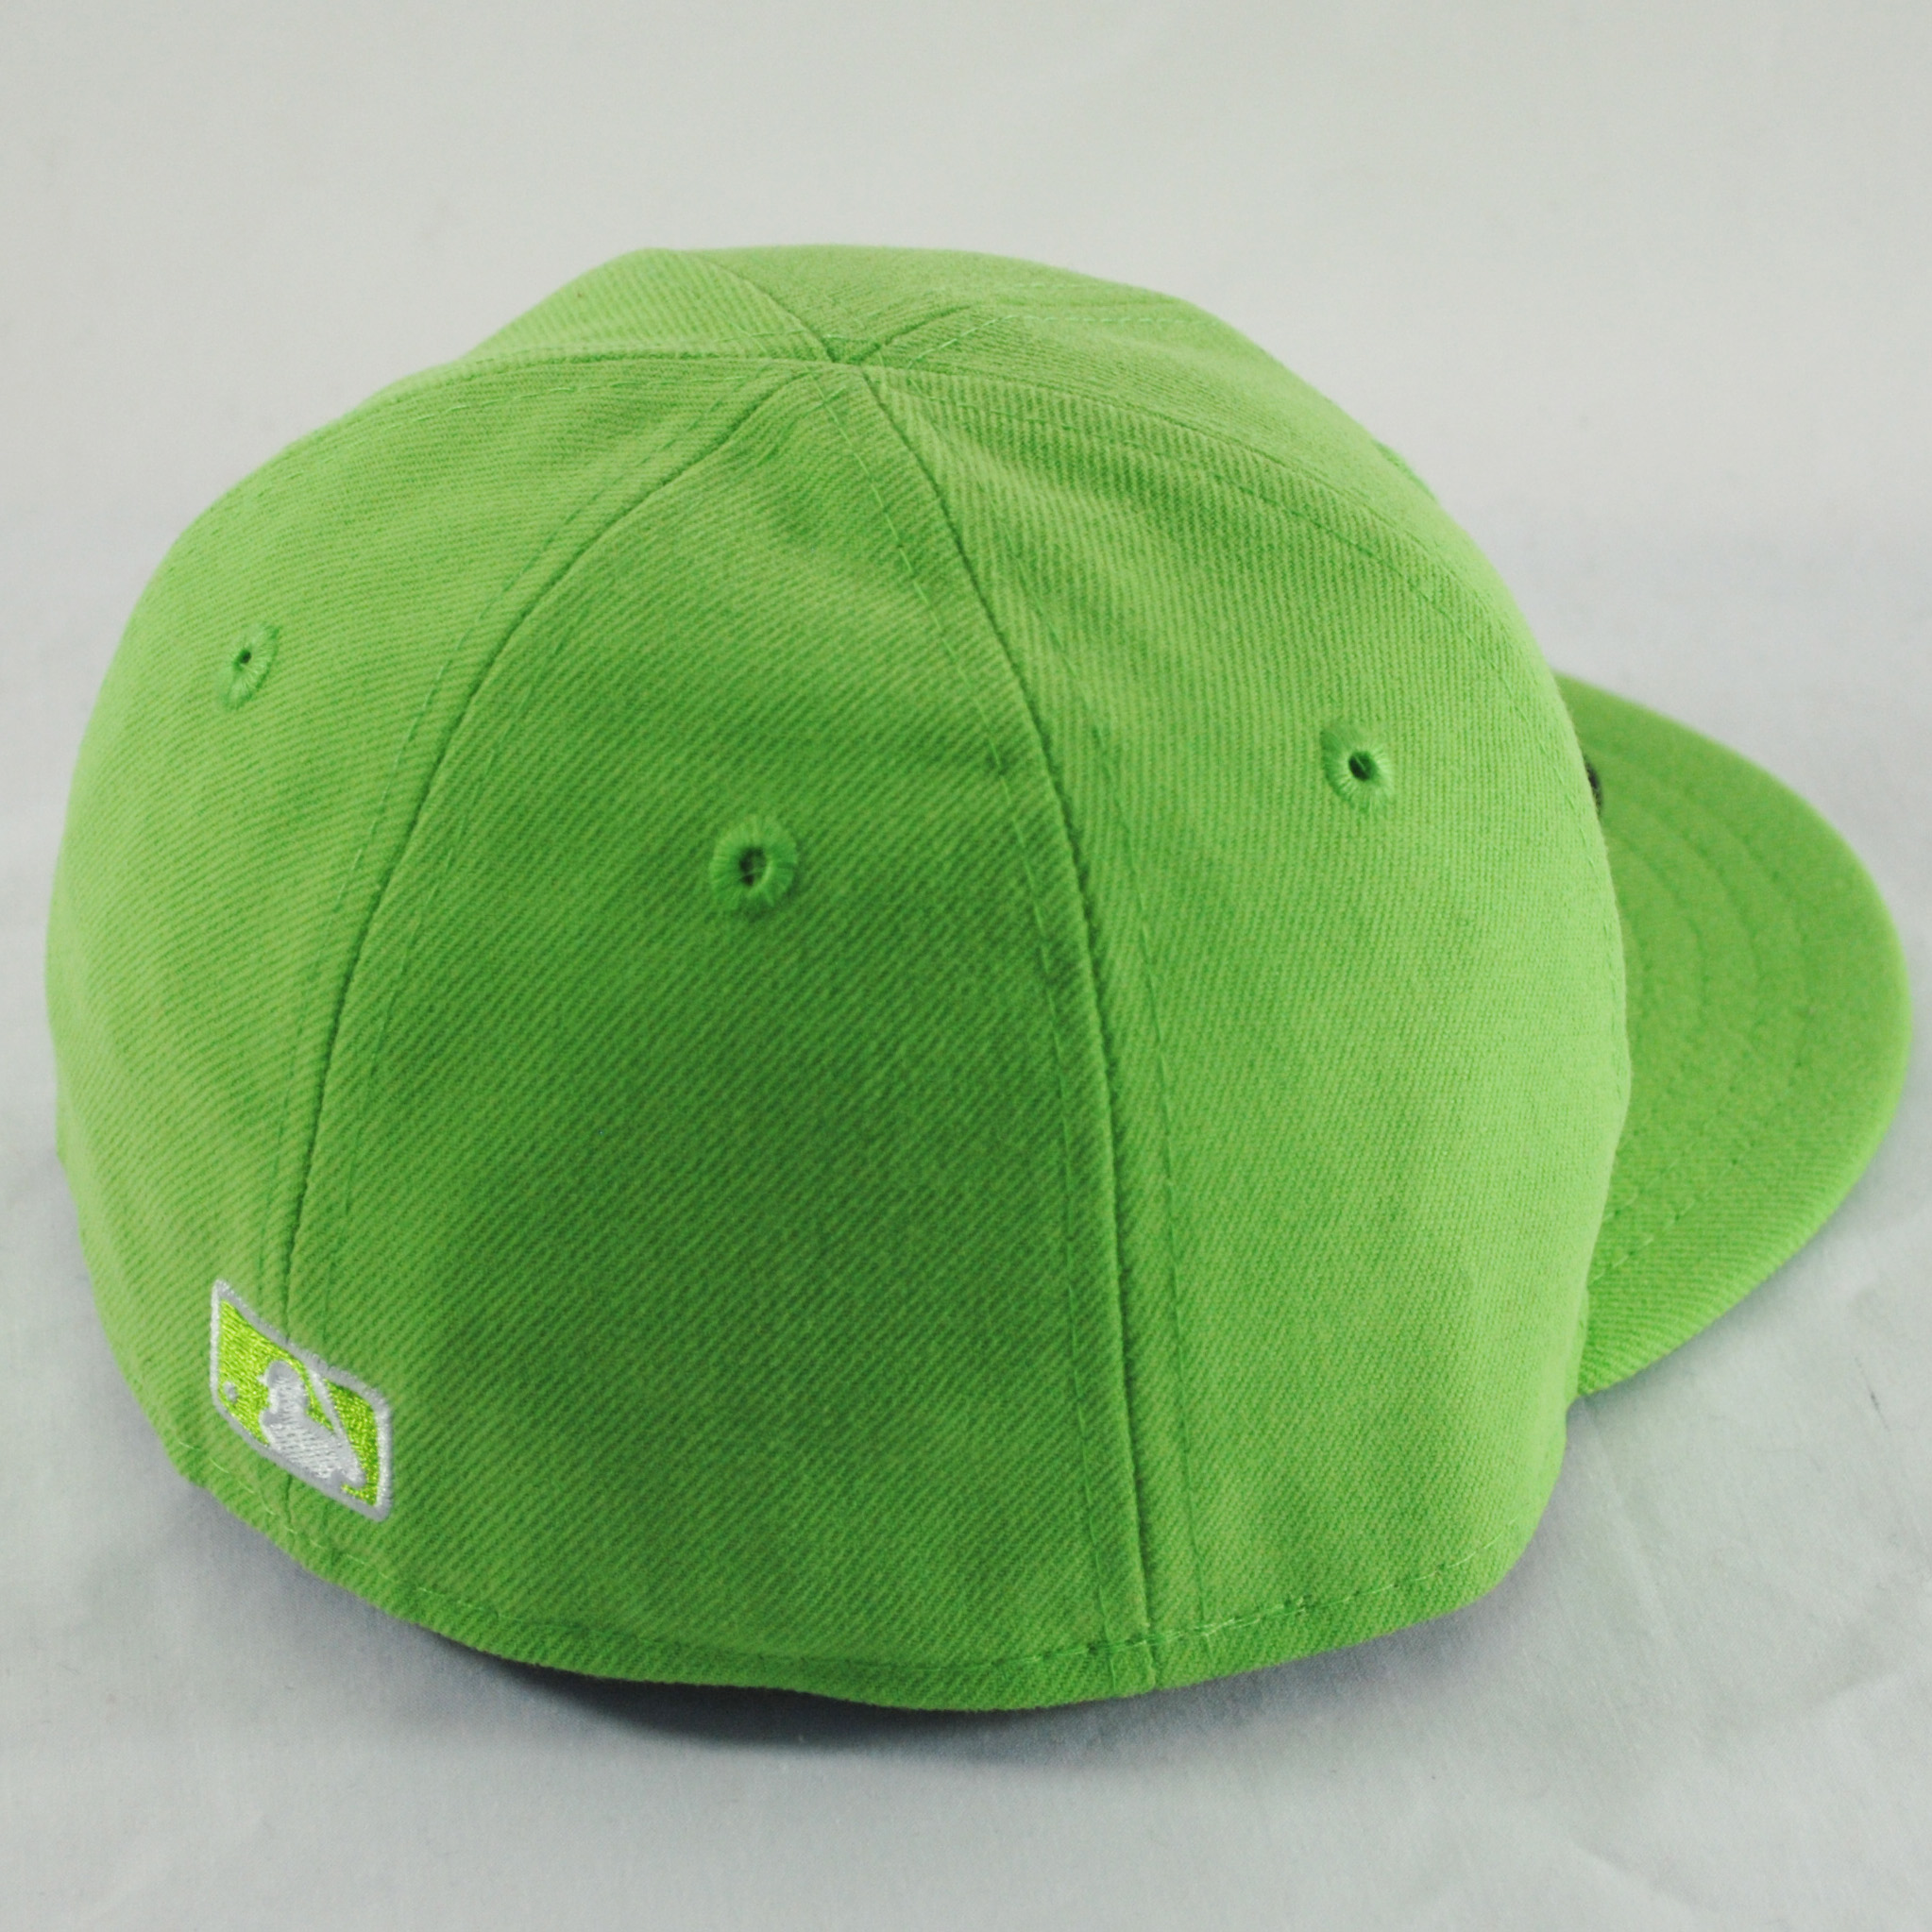 new era infant baby 59fifty ny yankees lime green mlb